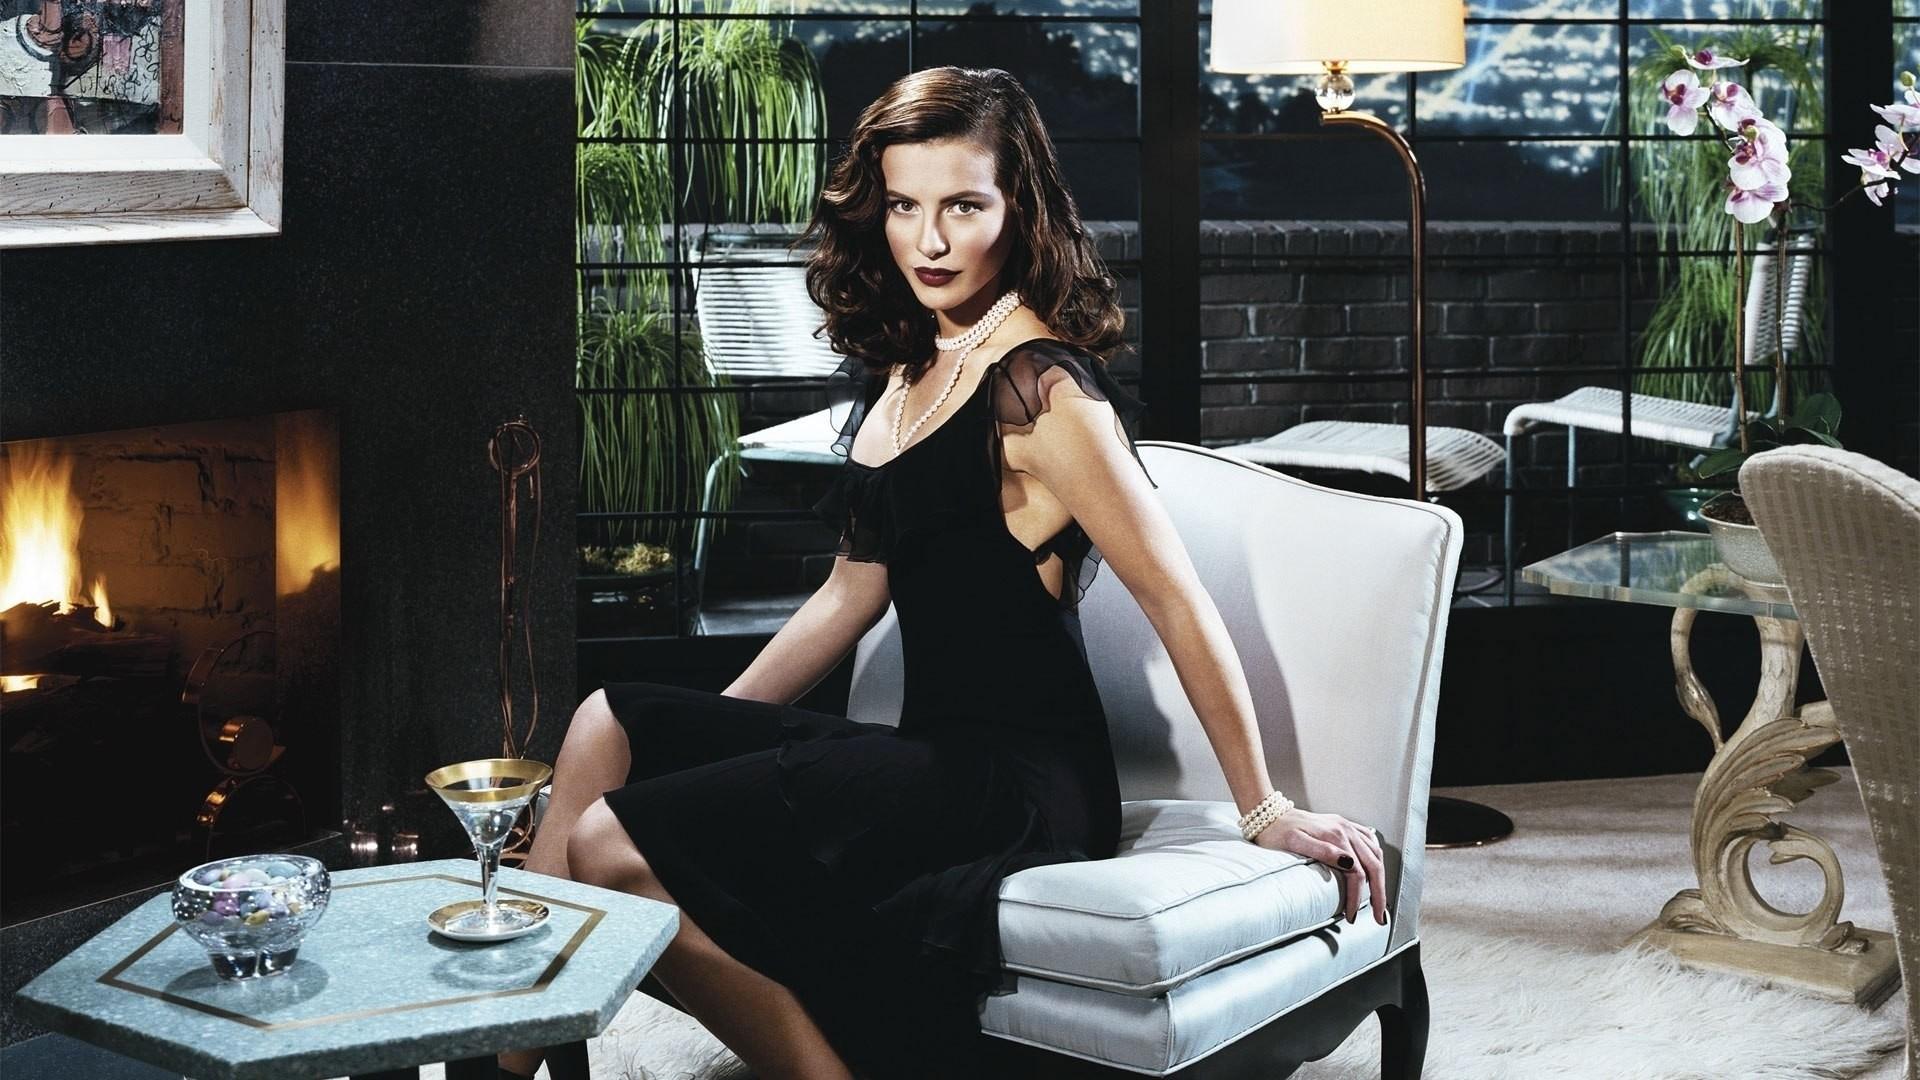 Kate Beckinsale Wallpaper HD